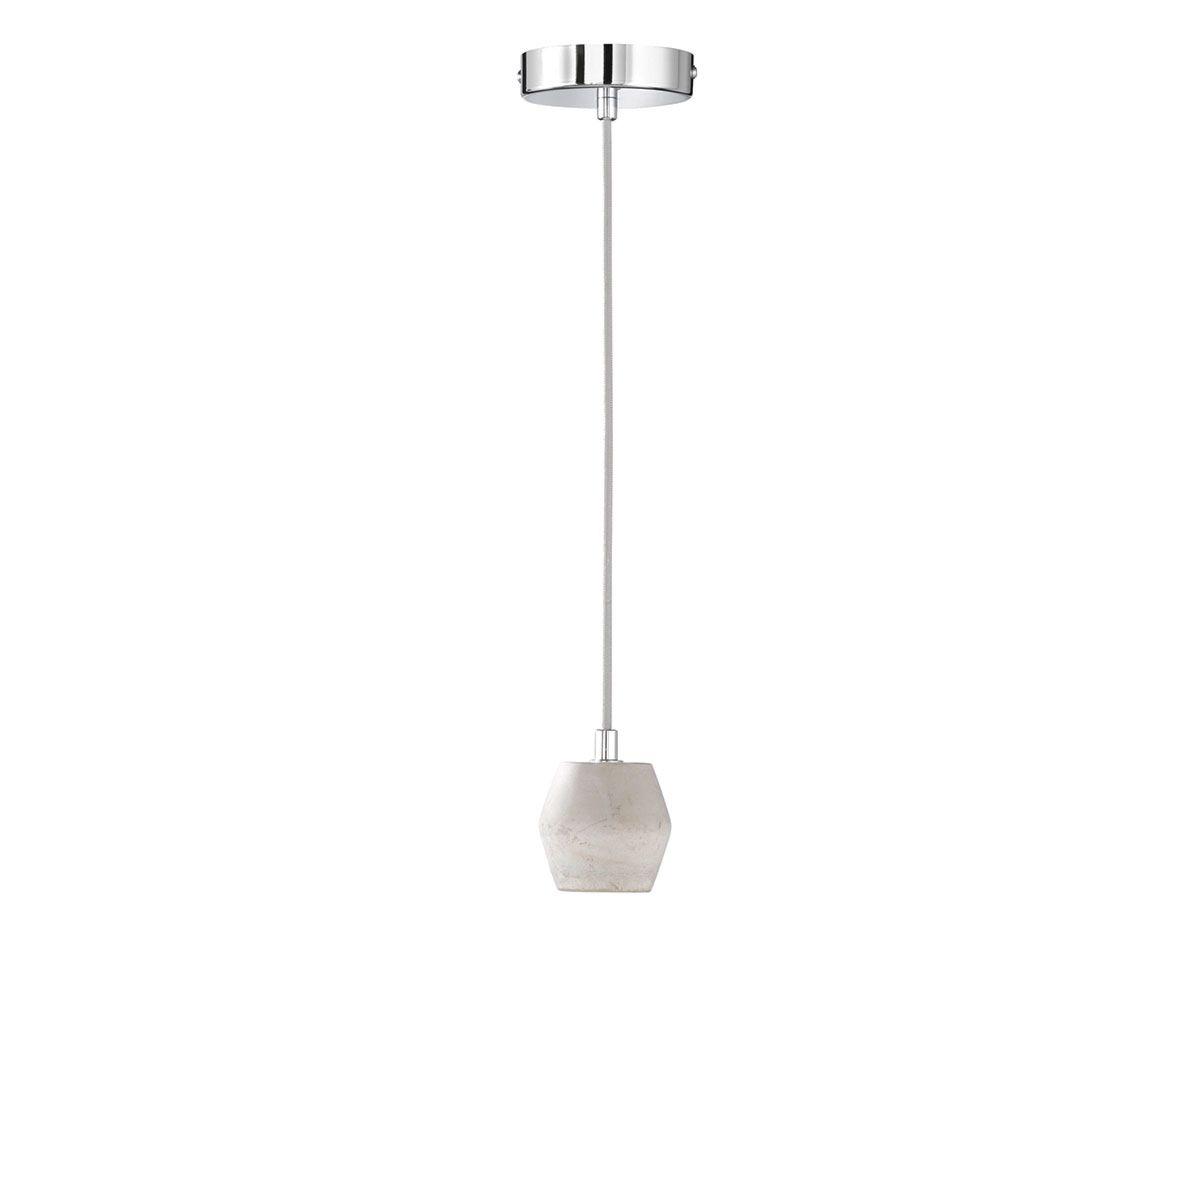 Wofi Luum Pendant Ceiling Light - Grey